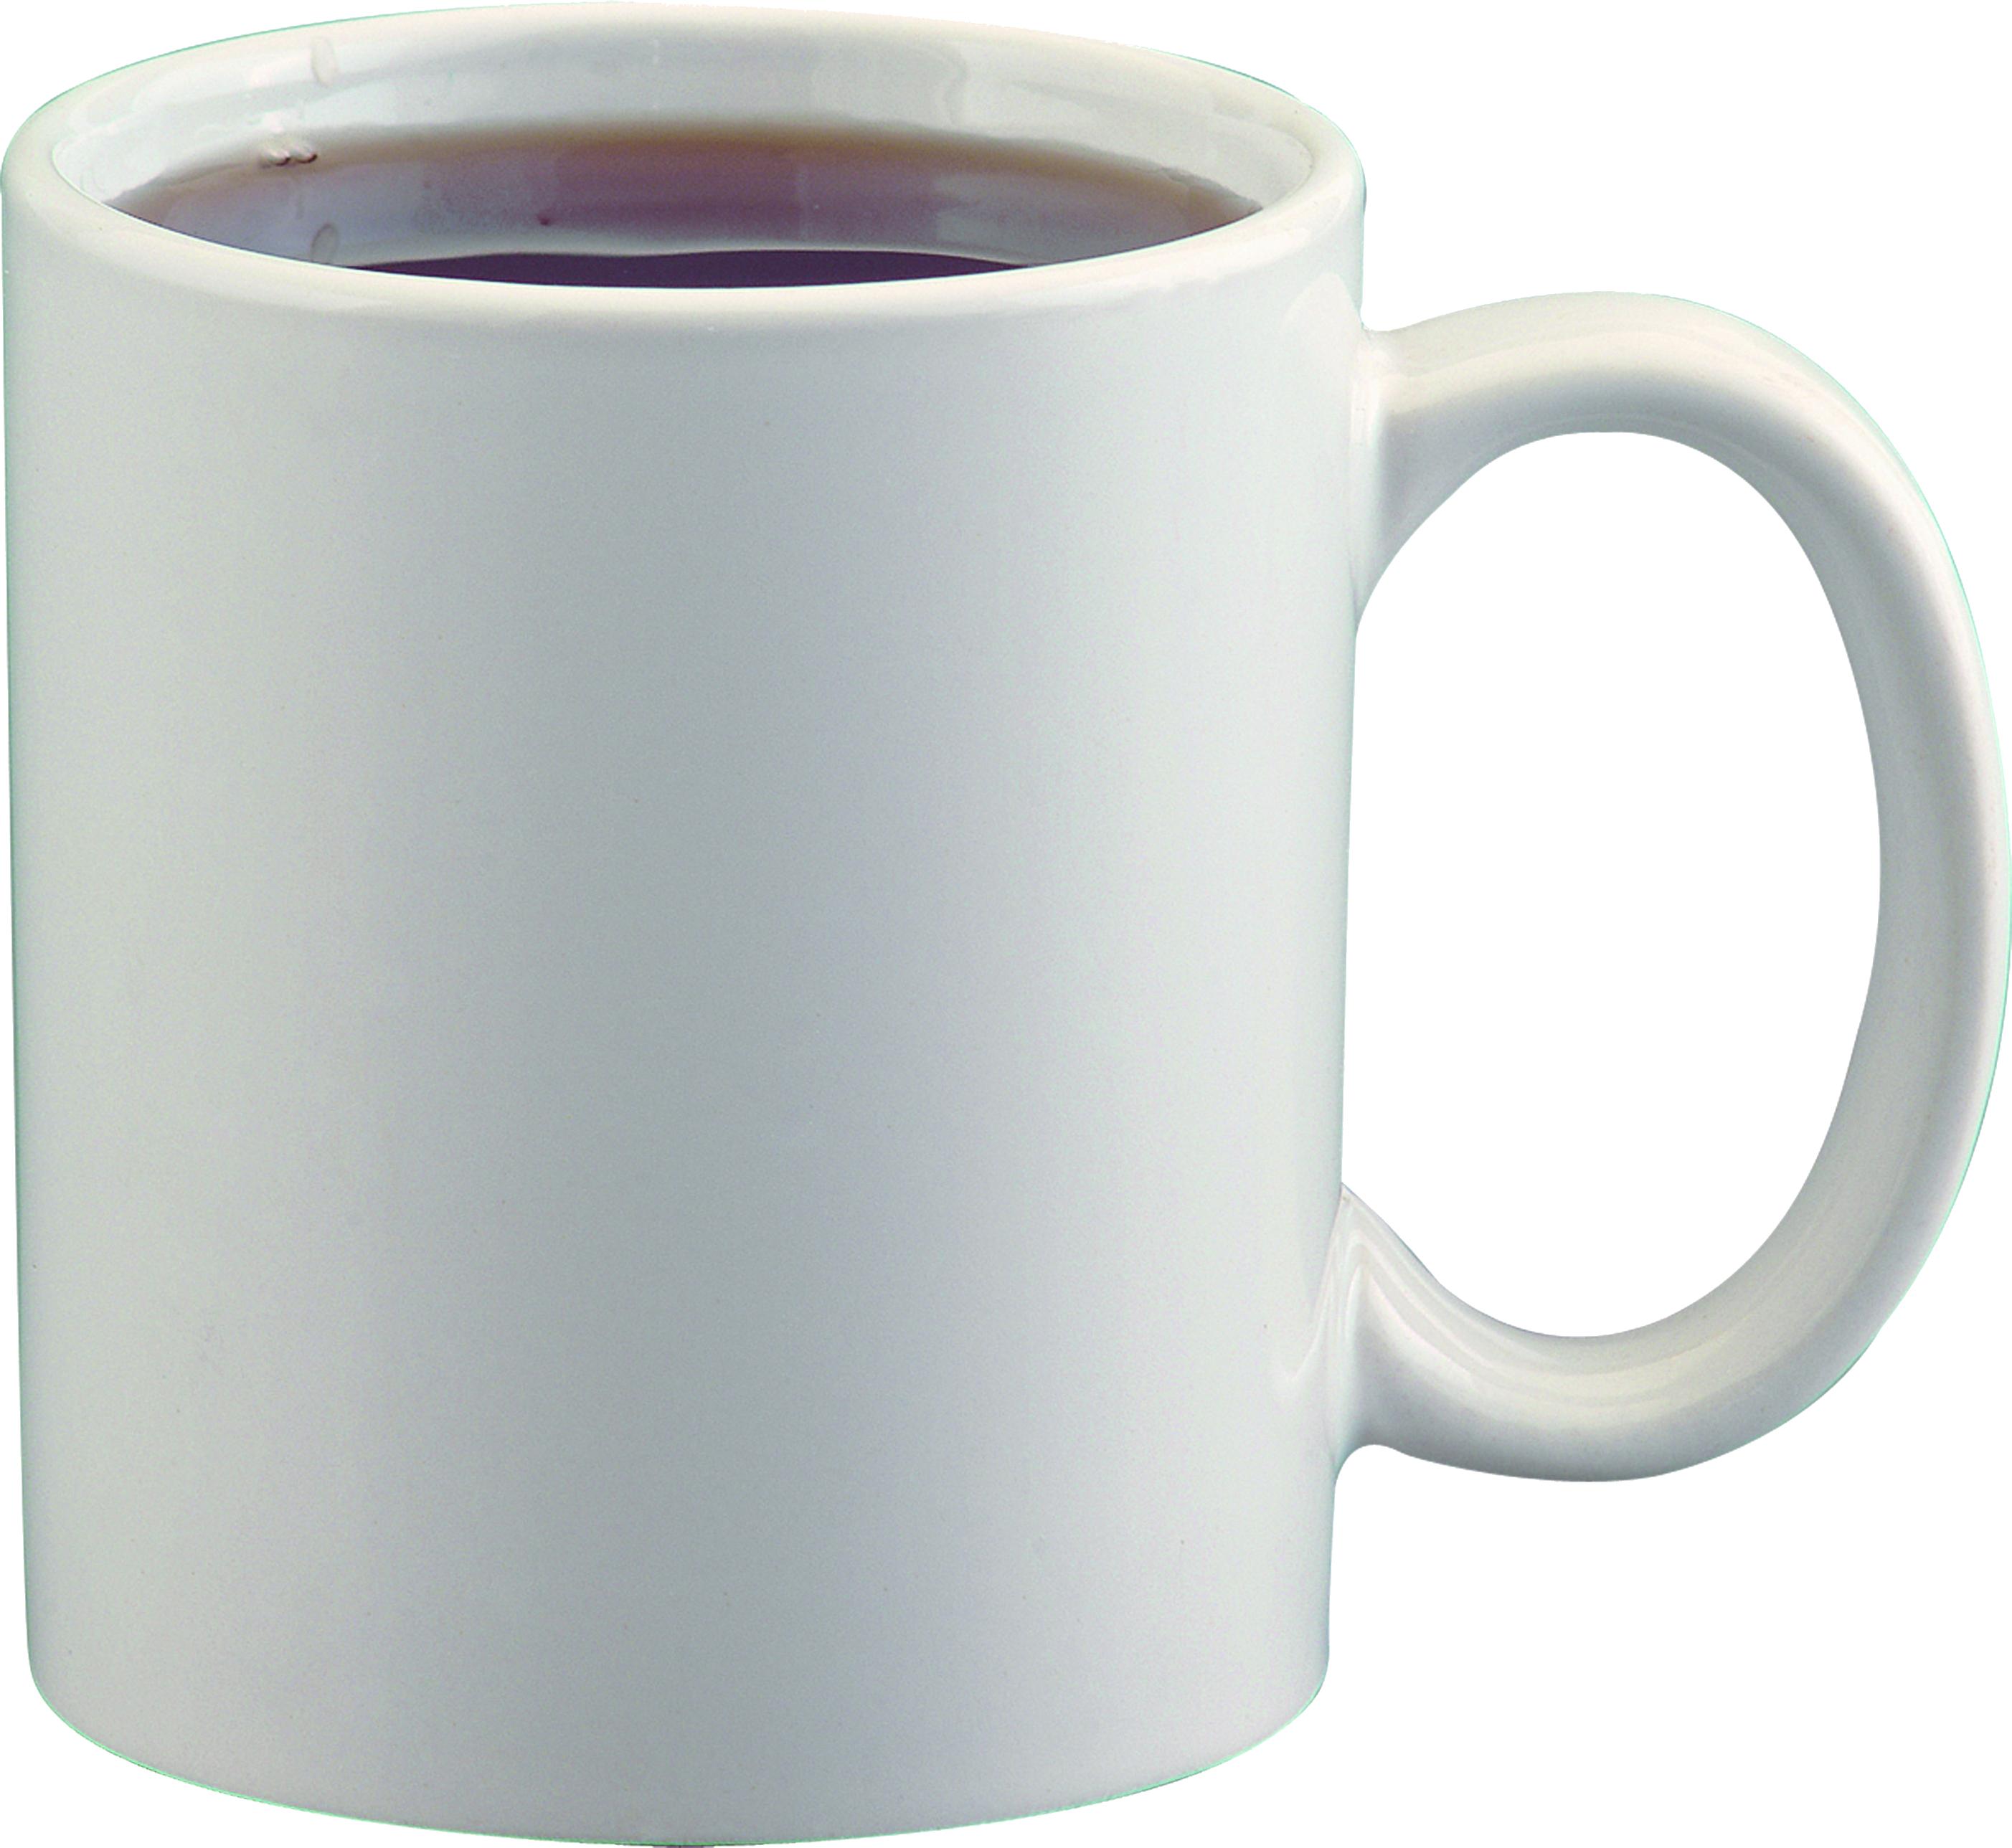 No money no coffee clipart graphic freeuse stock Coffee Cup No Background. Coffee Cup No Background F - Activavida.co graphic freeuse stock